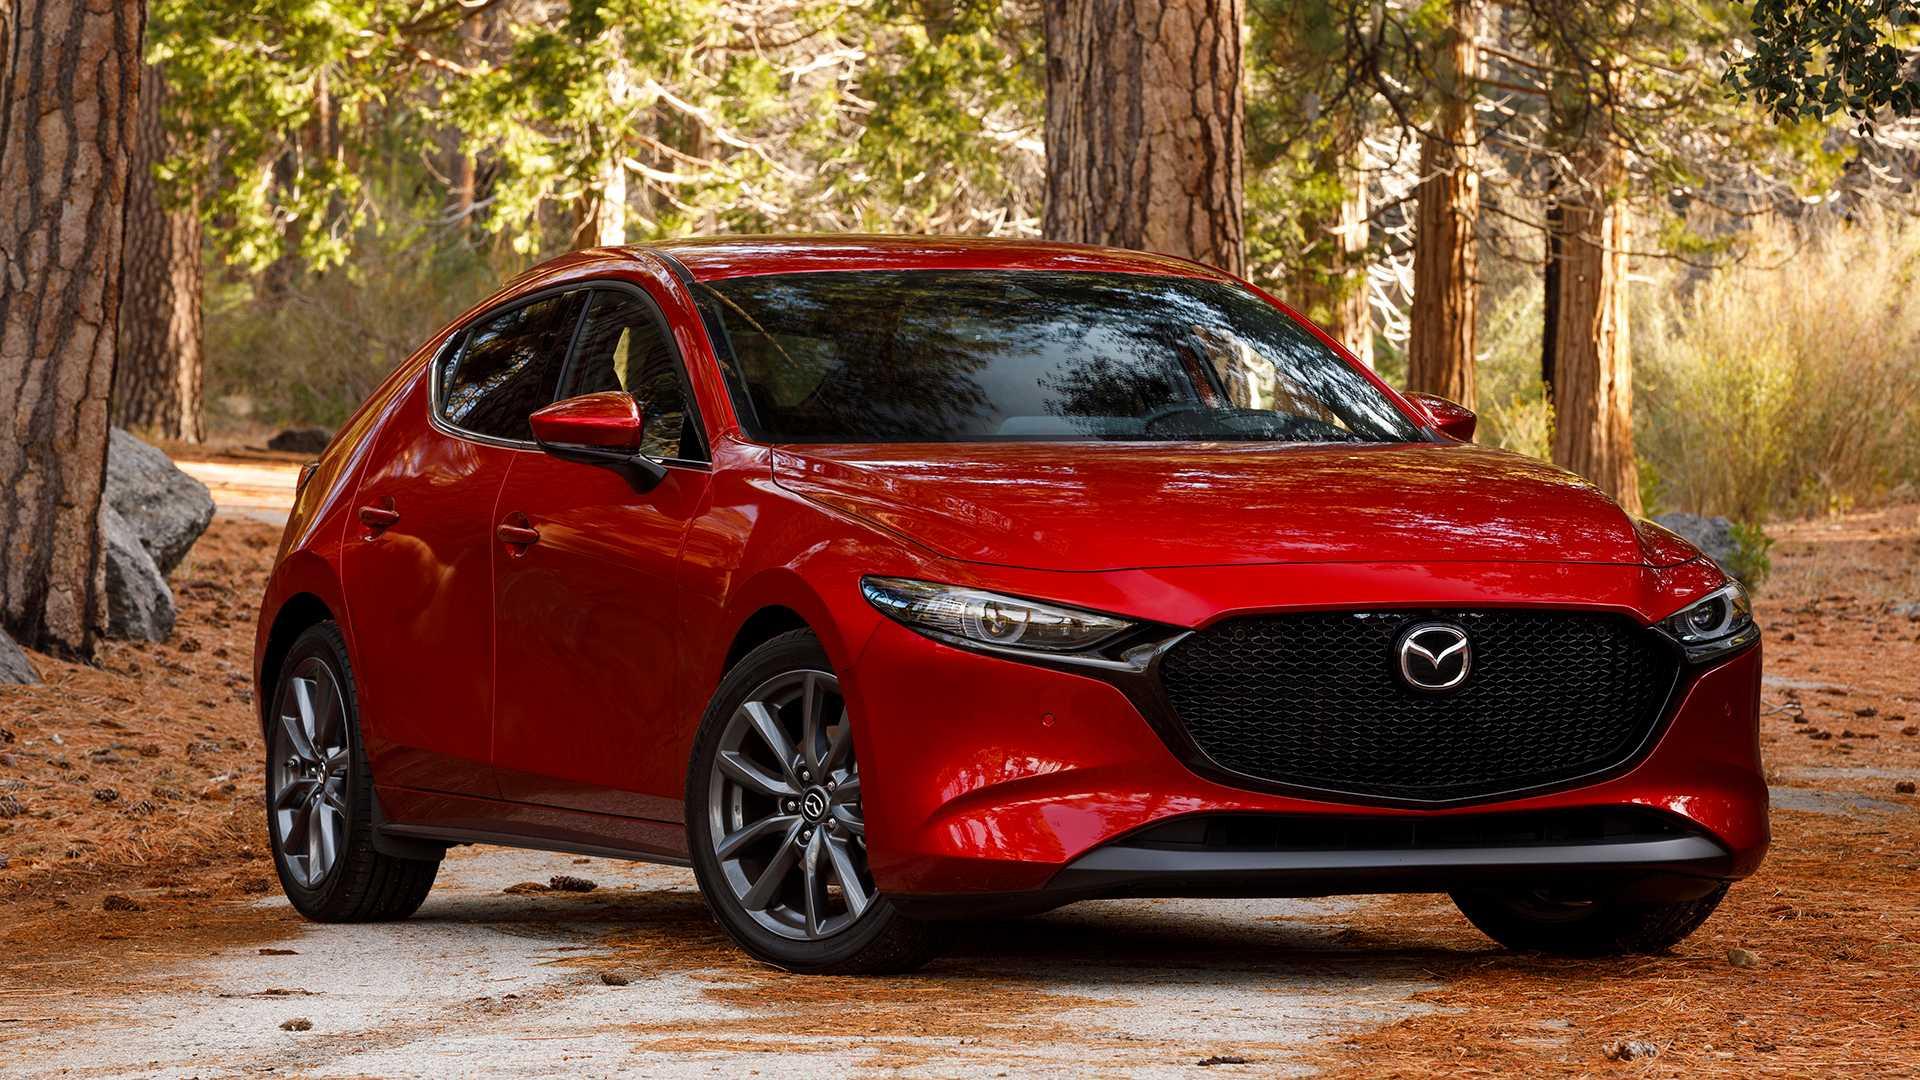 Mazda saopštila detalje o revolucionarnom SkyActiv-X motoru